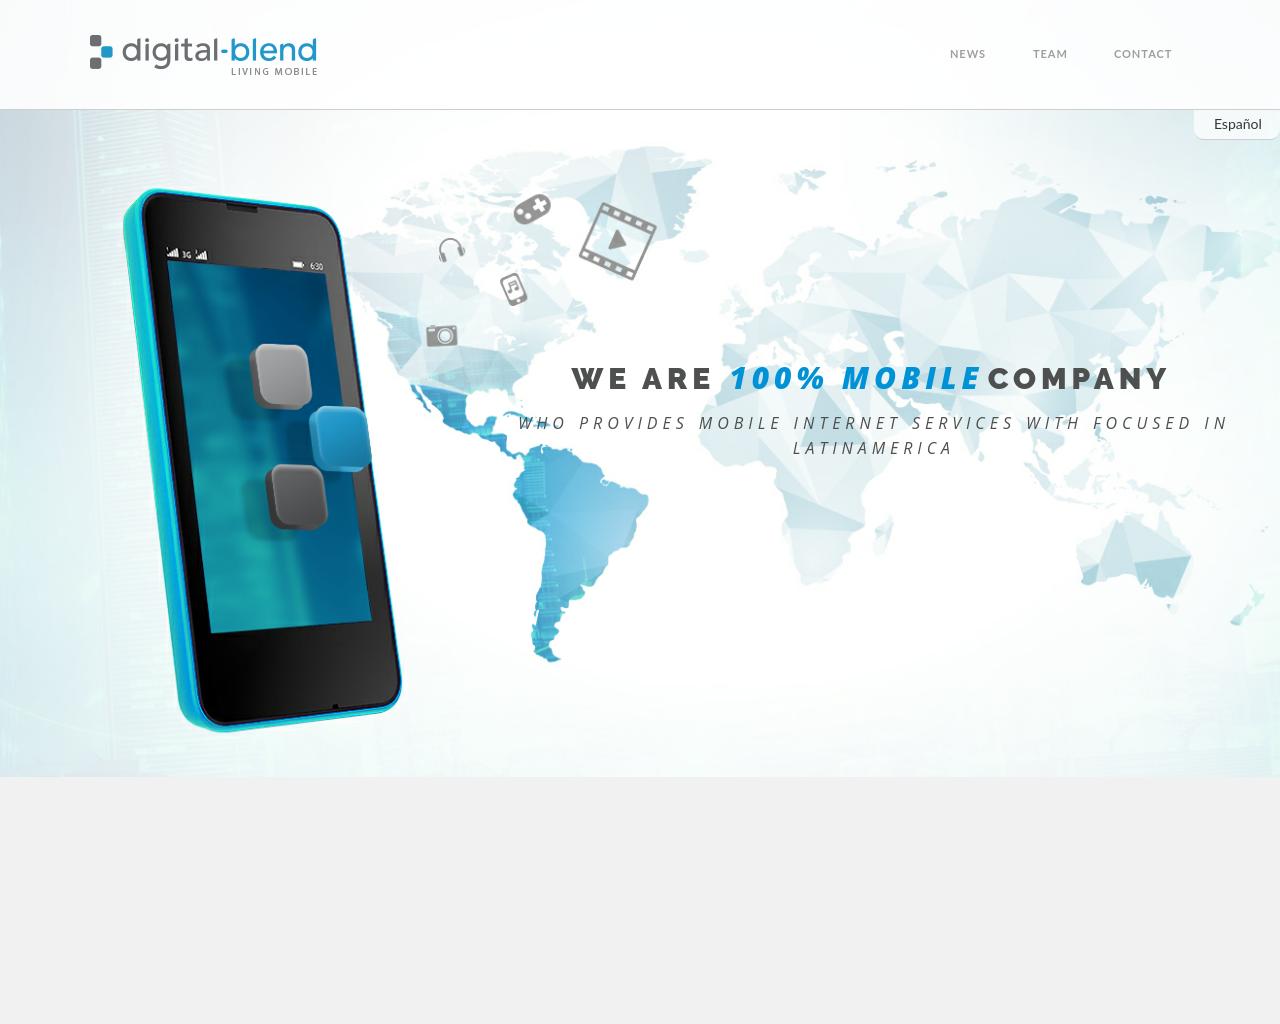 Digital-blend-Advertising-Reviews-Pricing